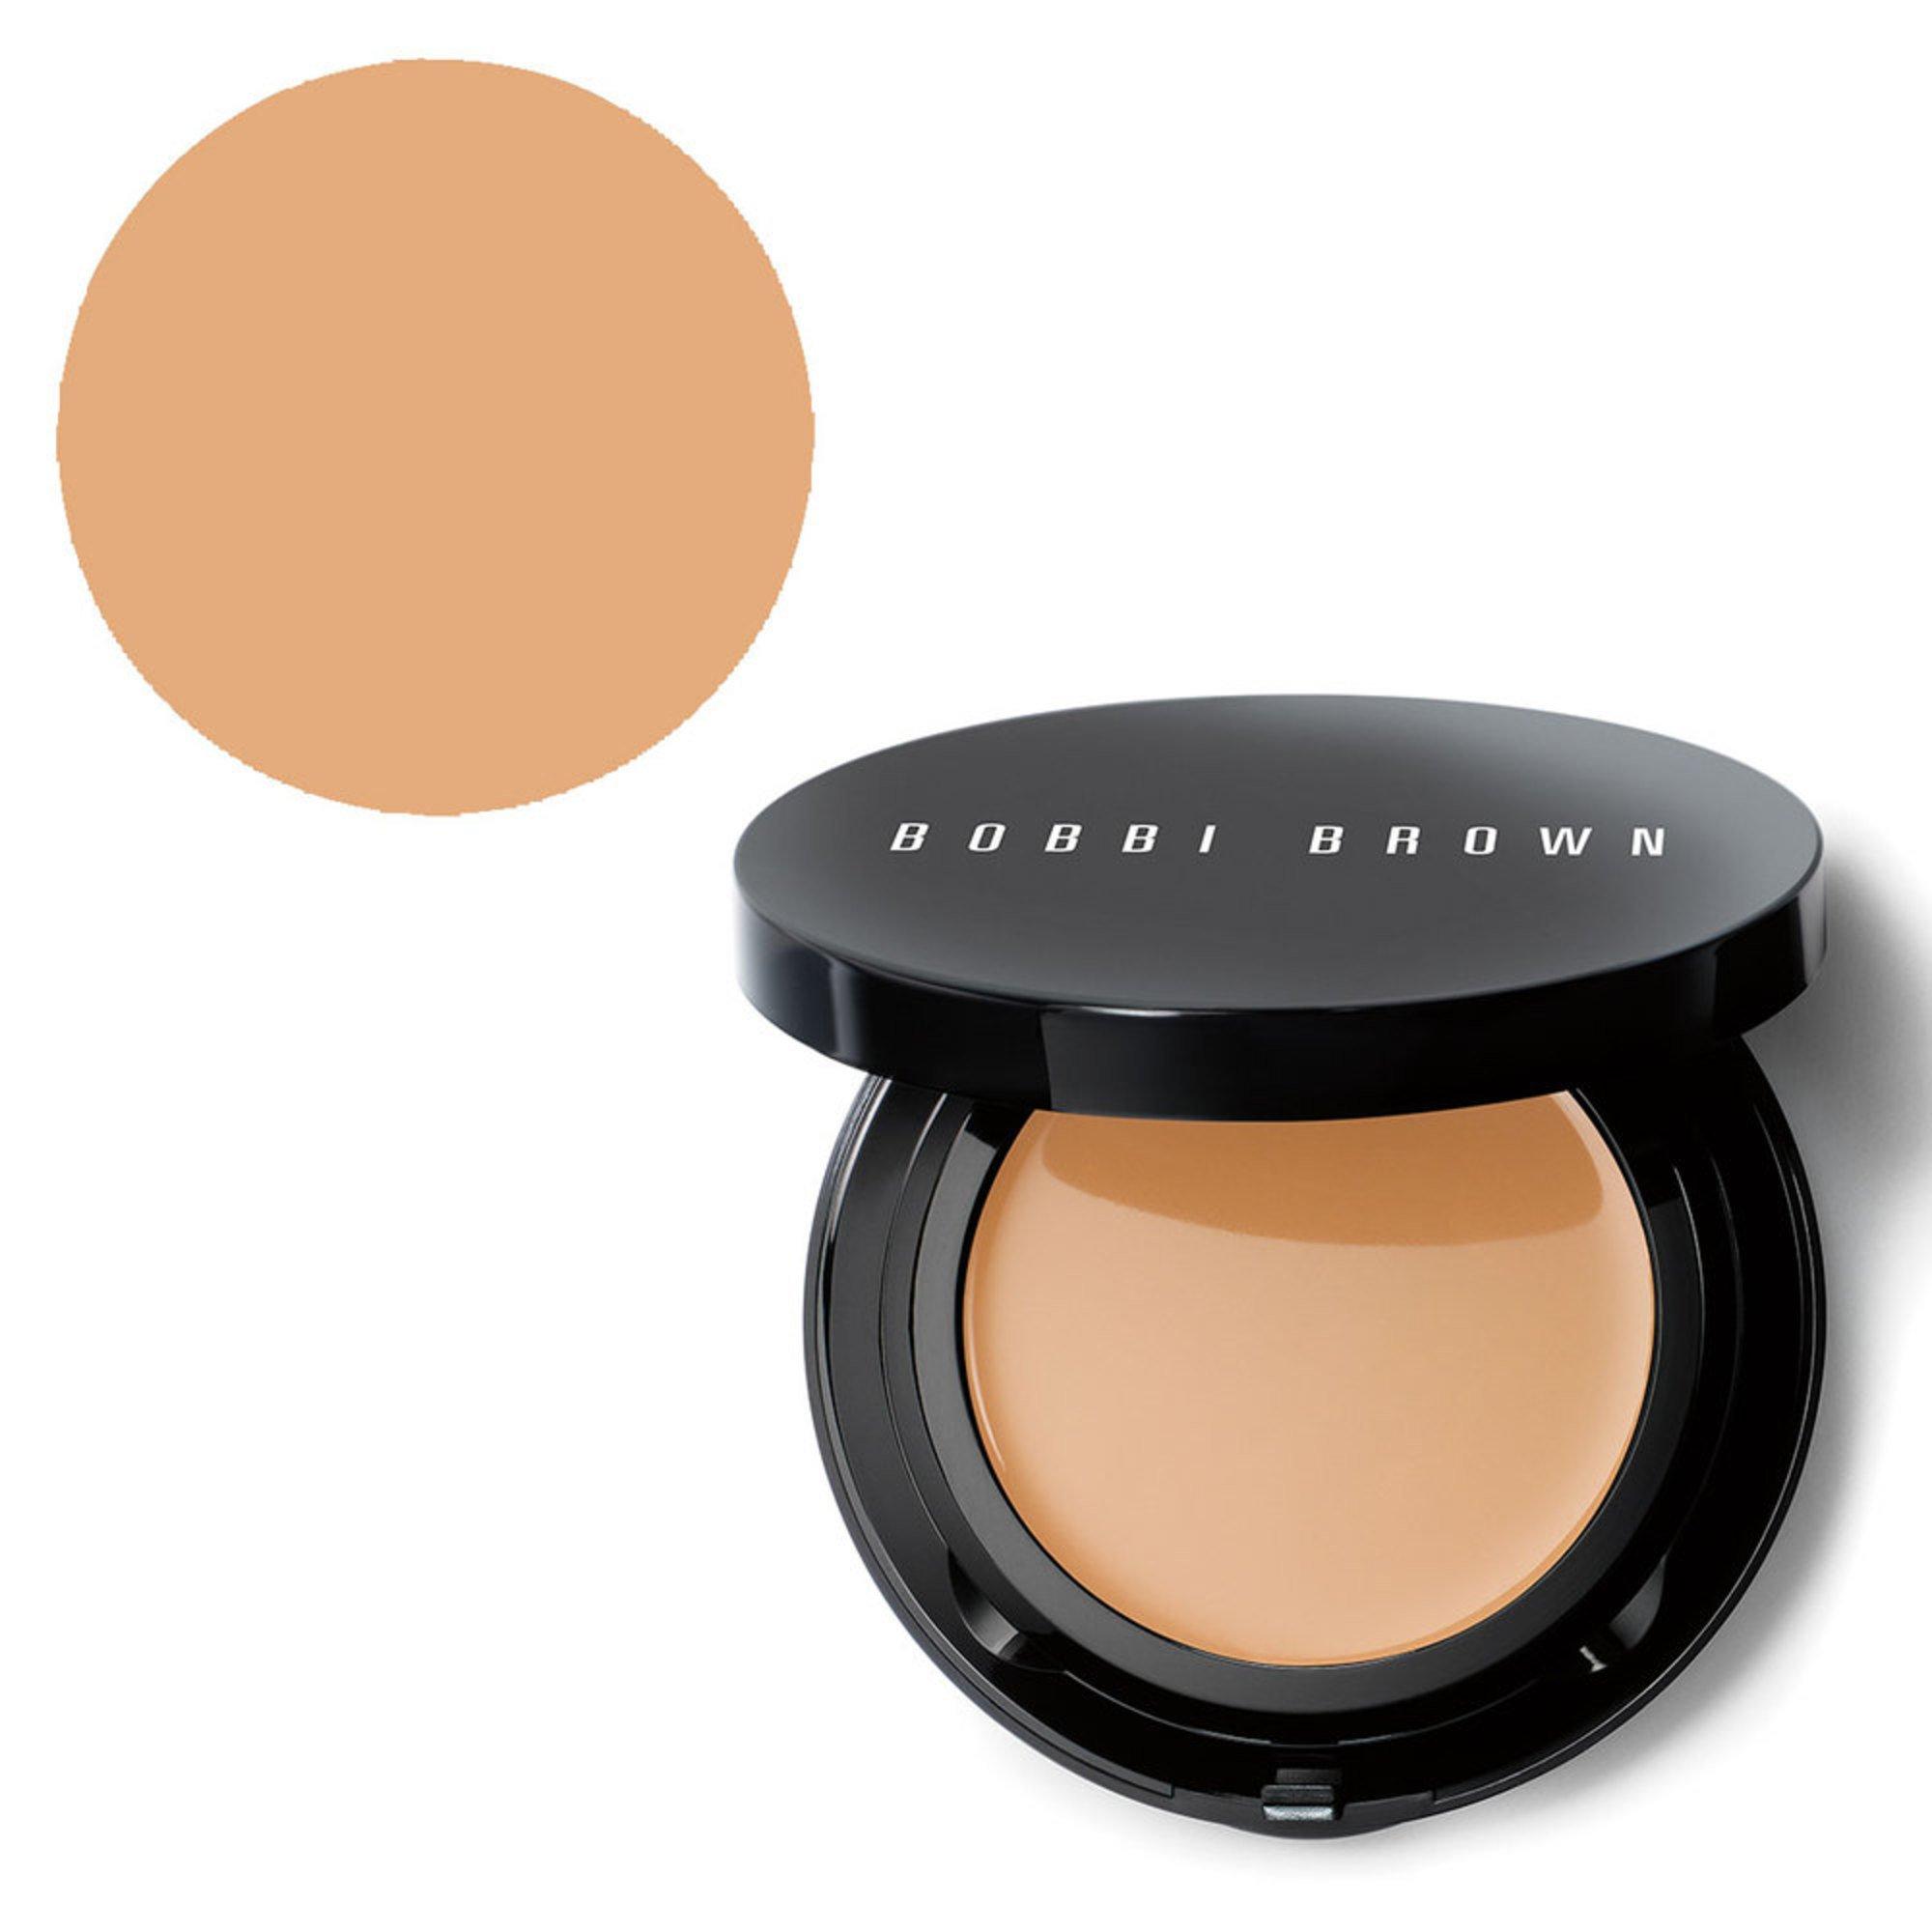 Bobbi Brown Skin Moisture Compact Foundation Natural Tan